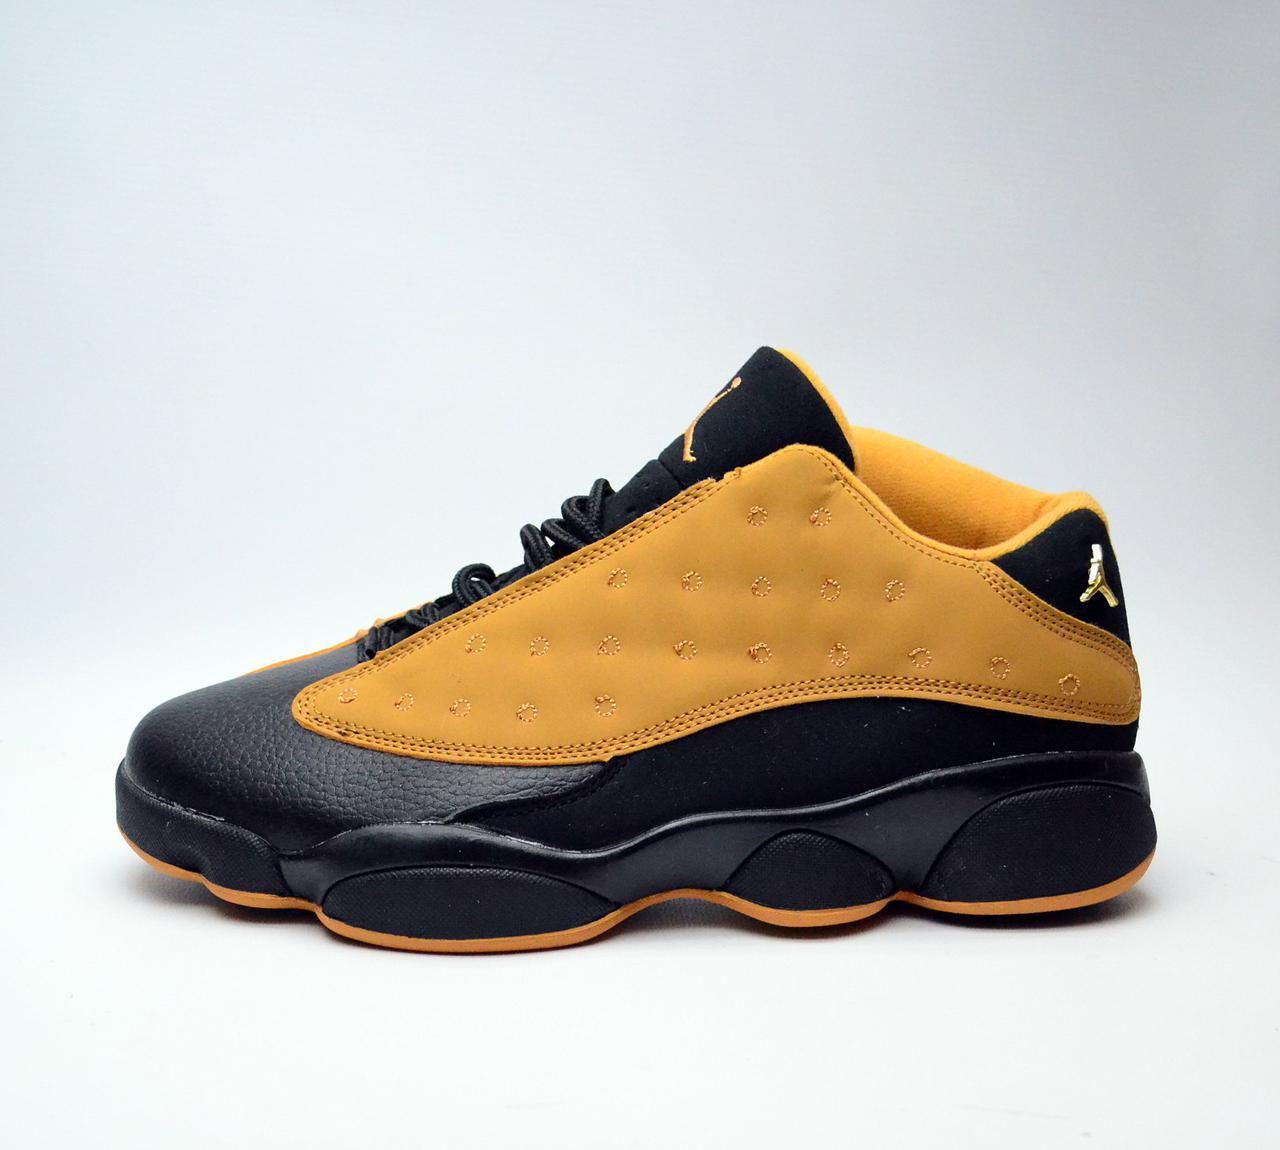 10a606bd5515 Мужские Кроссовки Nike Air Jordan XIII Low (Реплика) — в Категории